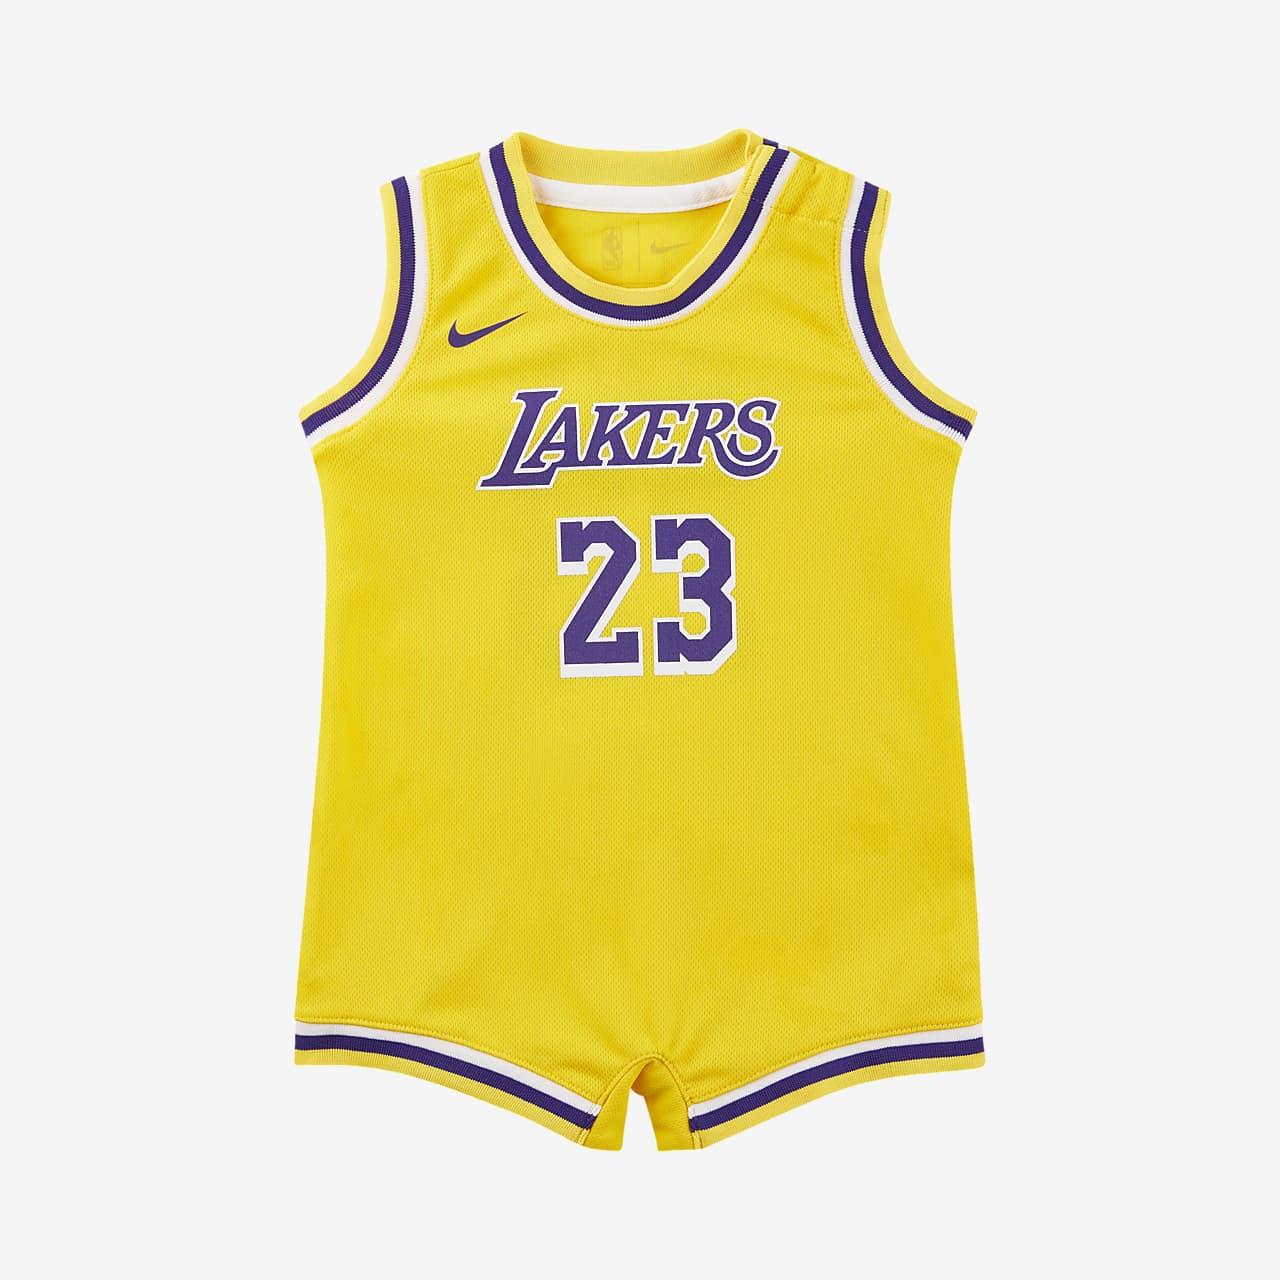 洛杉矶湖人队 (LeBron James) Icon Edition Nike NBA 婴童连体衣